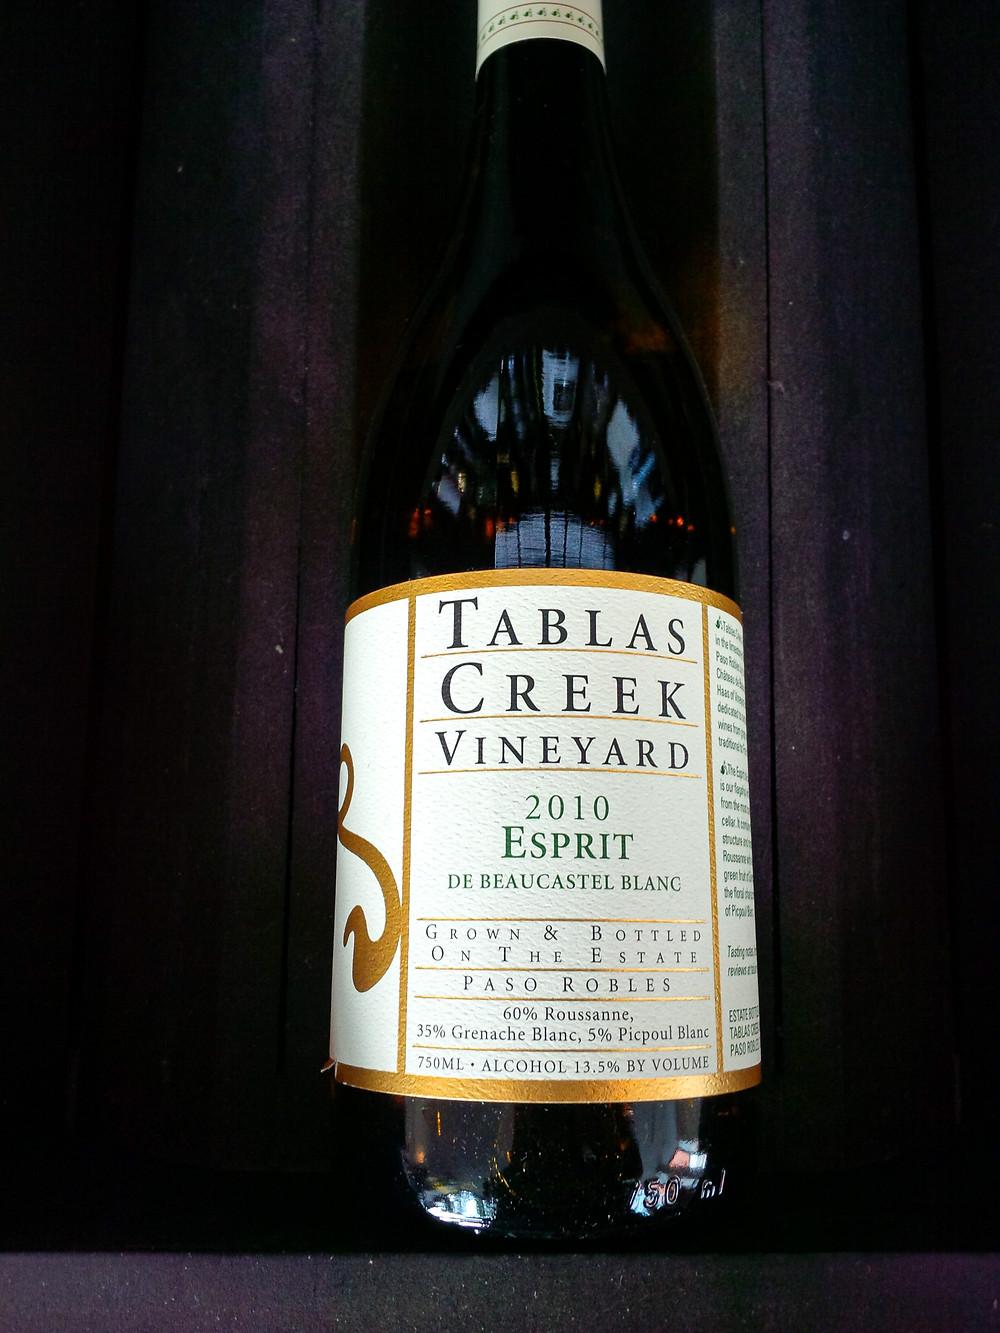 Tablas Creek wine at Hanging Ditch wine merchant in Manchester, England